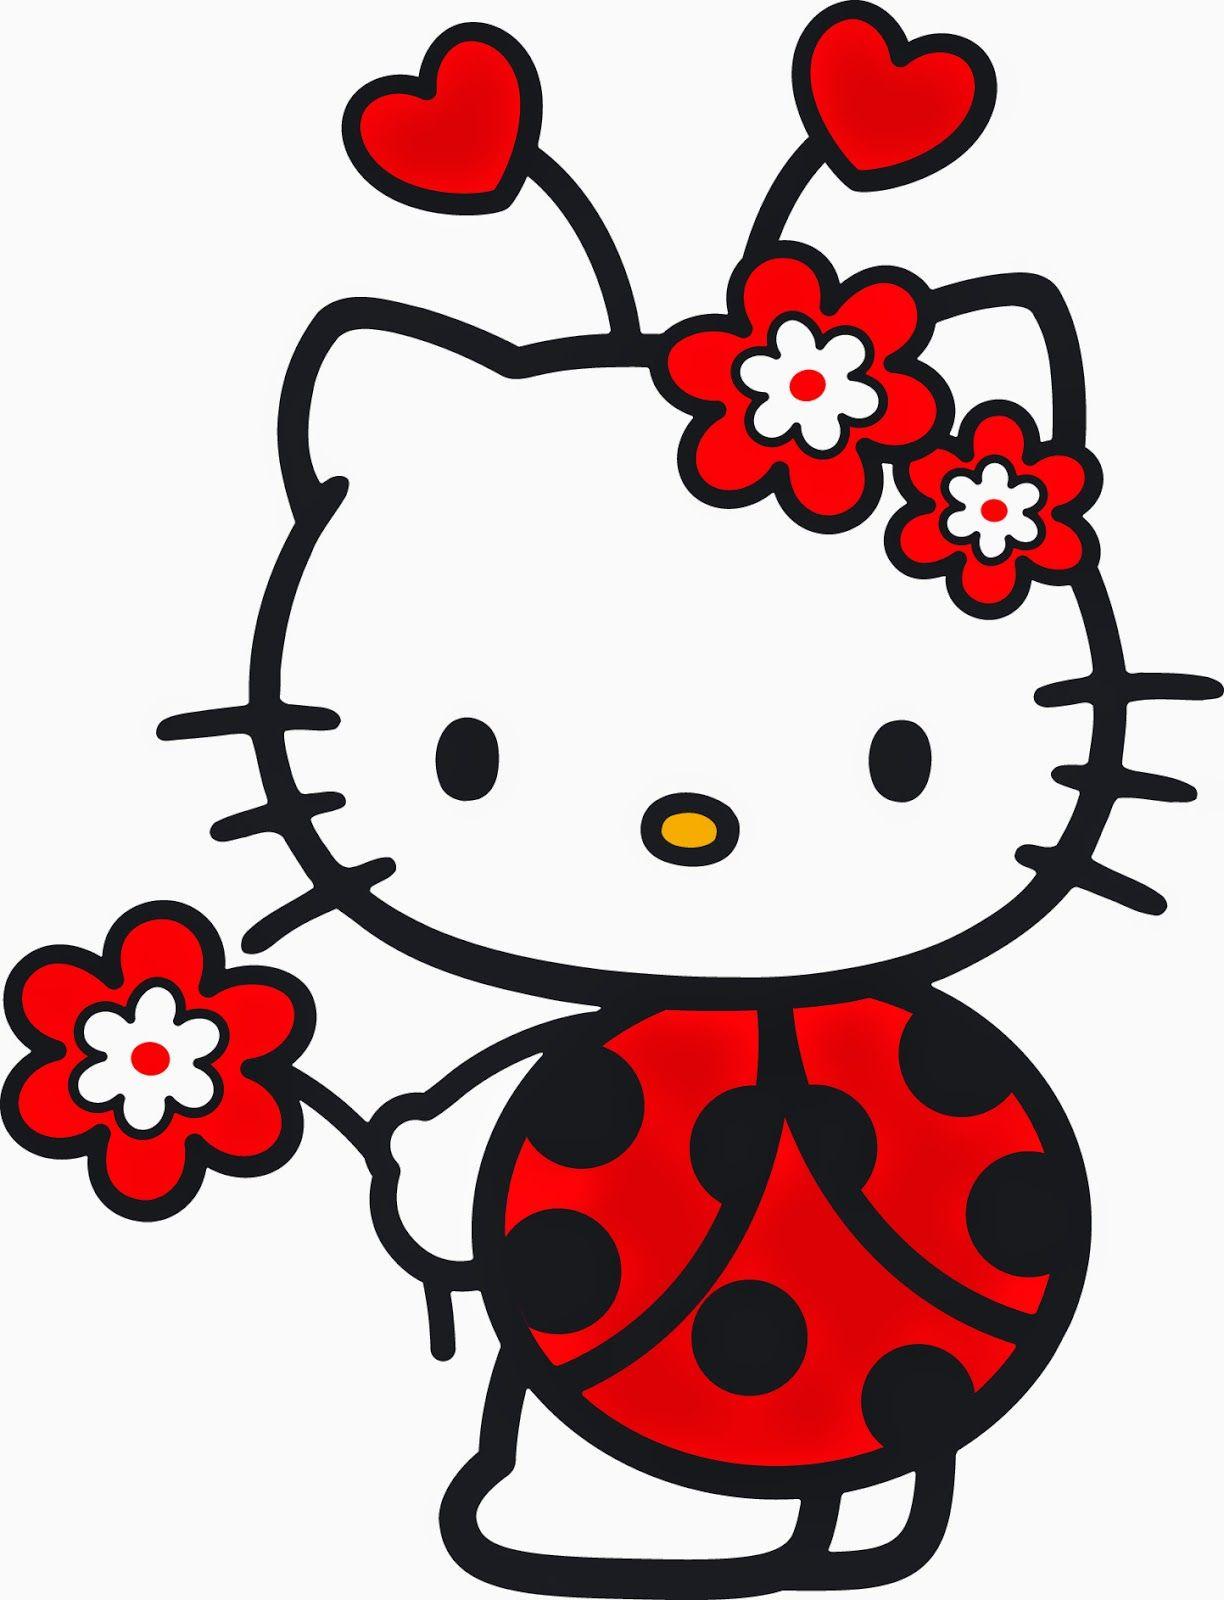 Wonderful Wallpaper Hello Kitty White - a7b8e5ca441c203355ab74183069f280  Image_59516.jpg